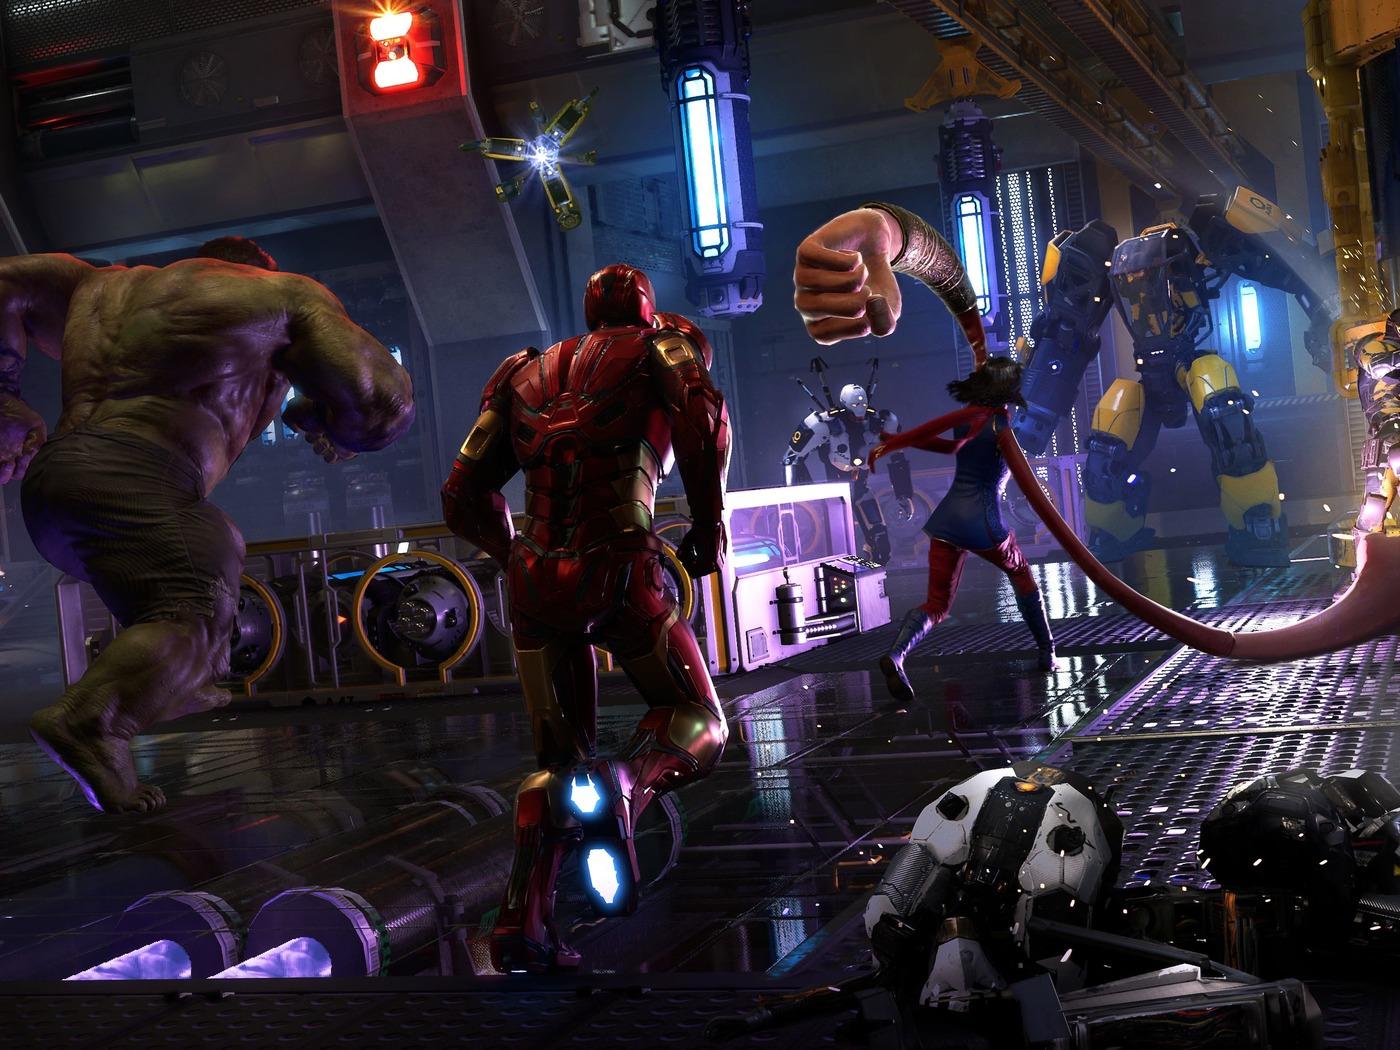 marvels-avengers-iron-man-hulk-kamala-khan-9f.jpg